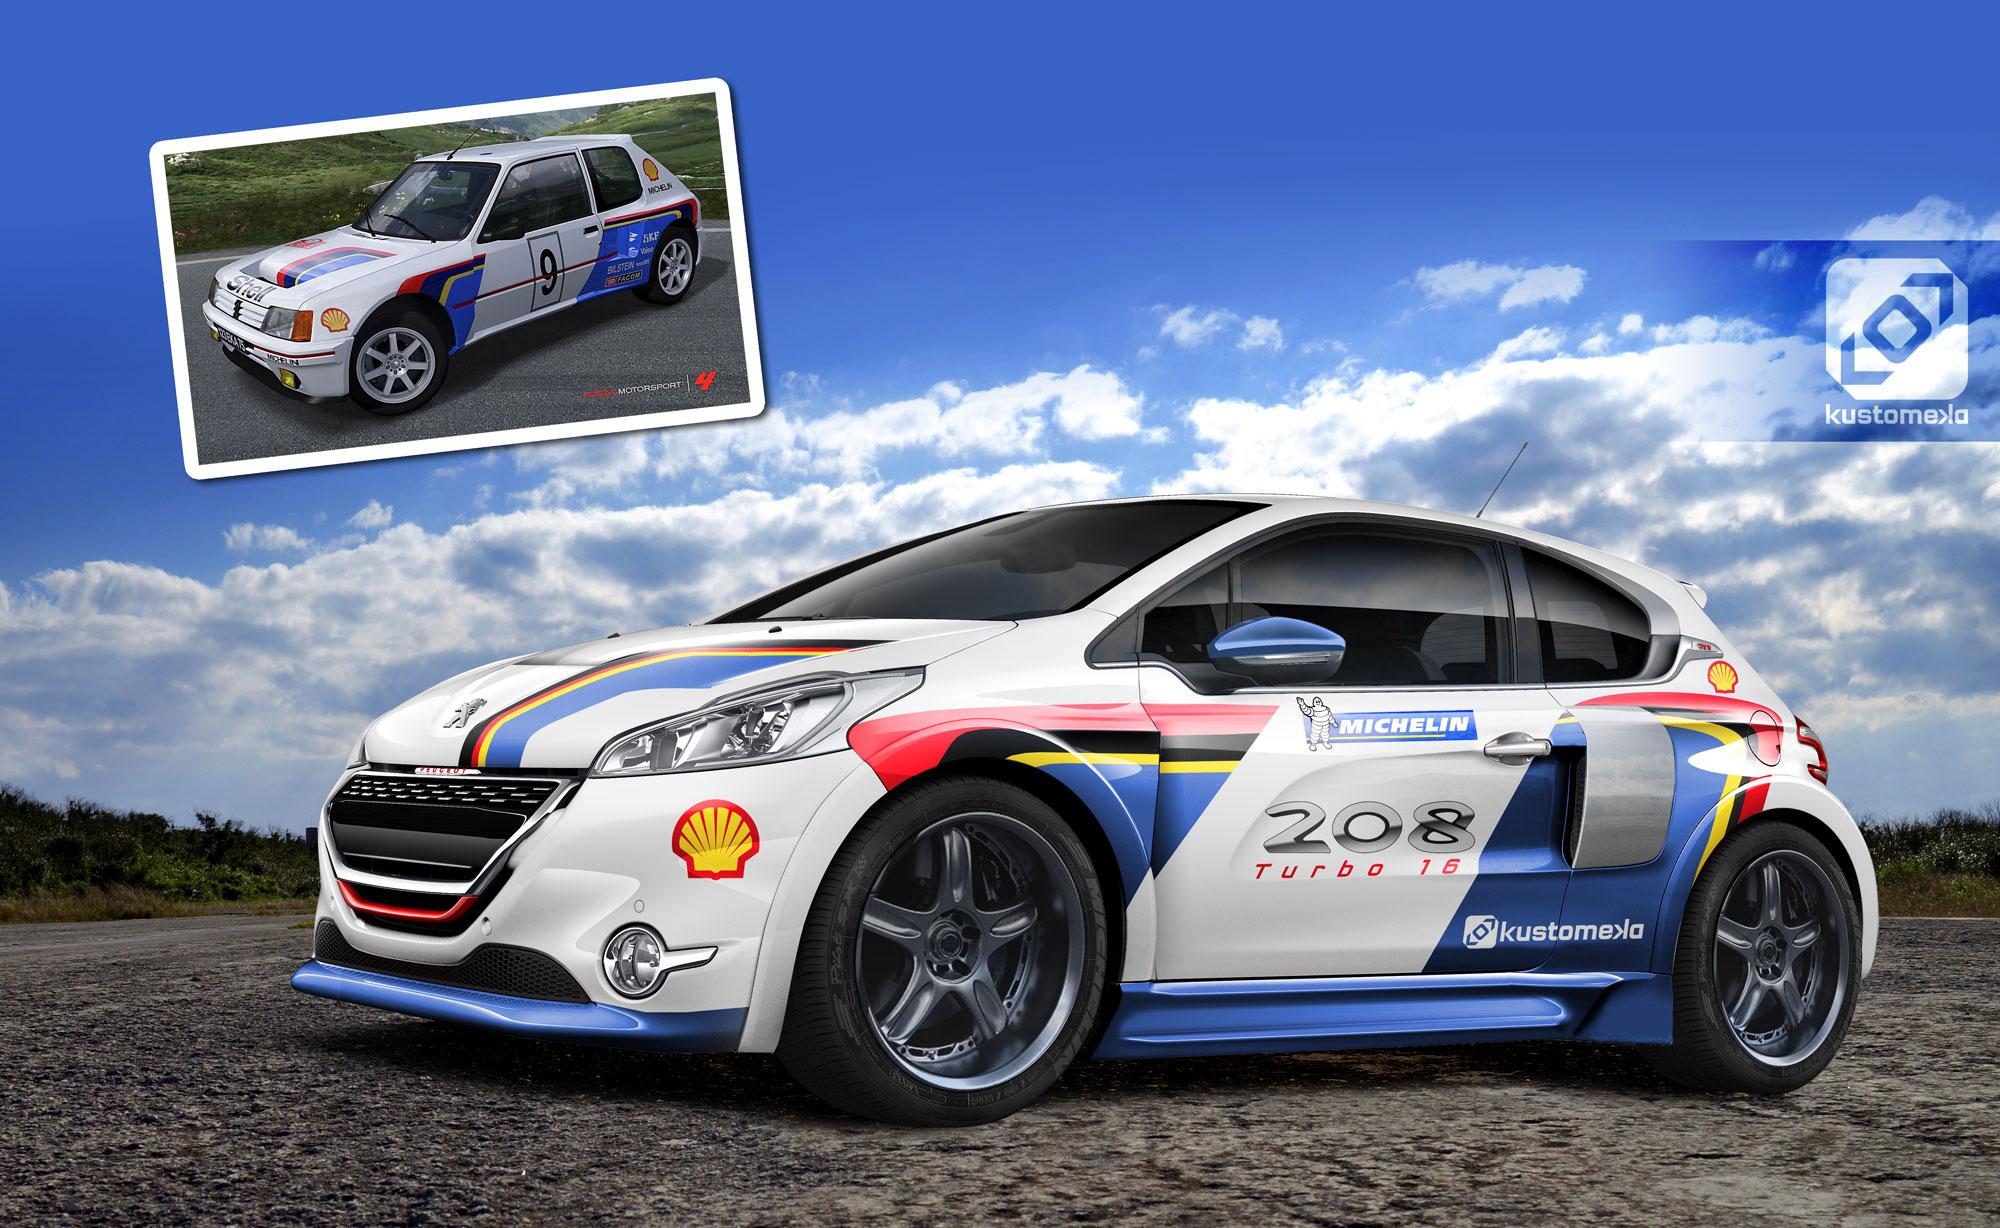 Peugeot 208 T16